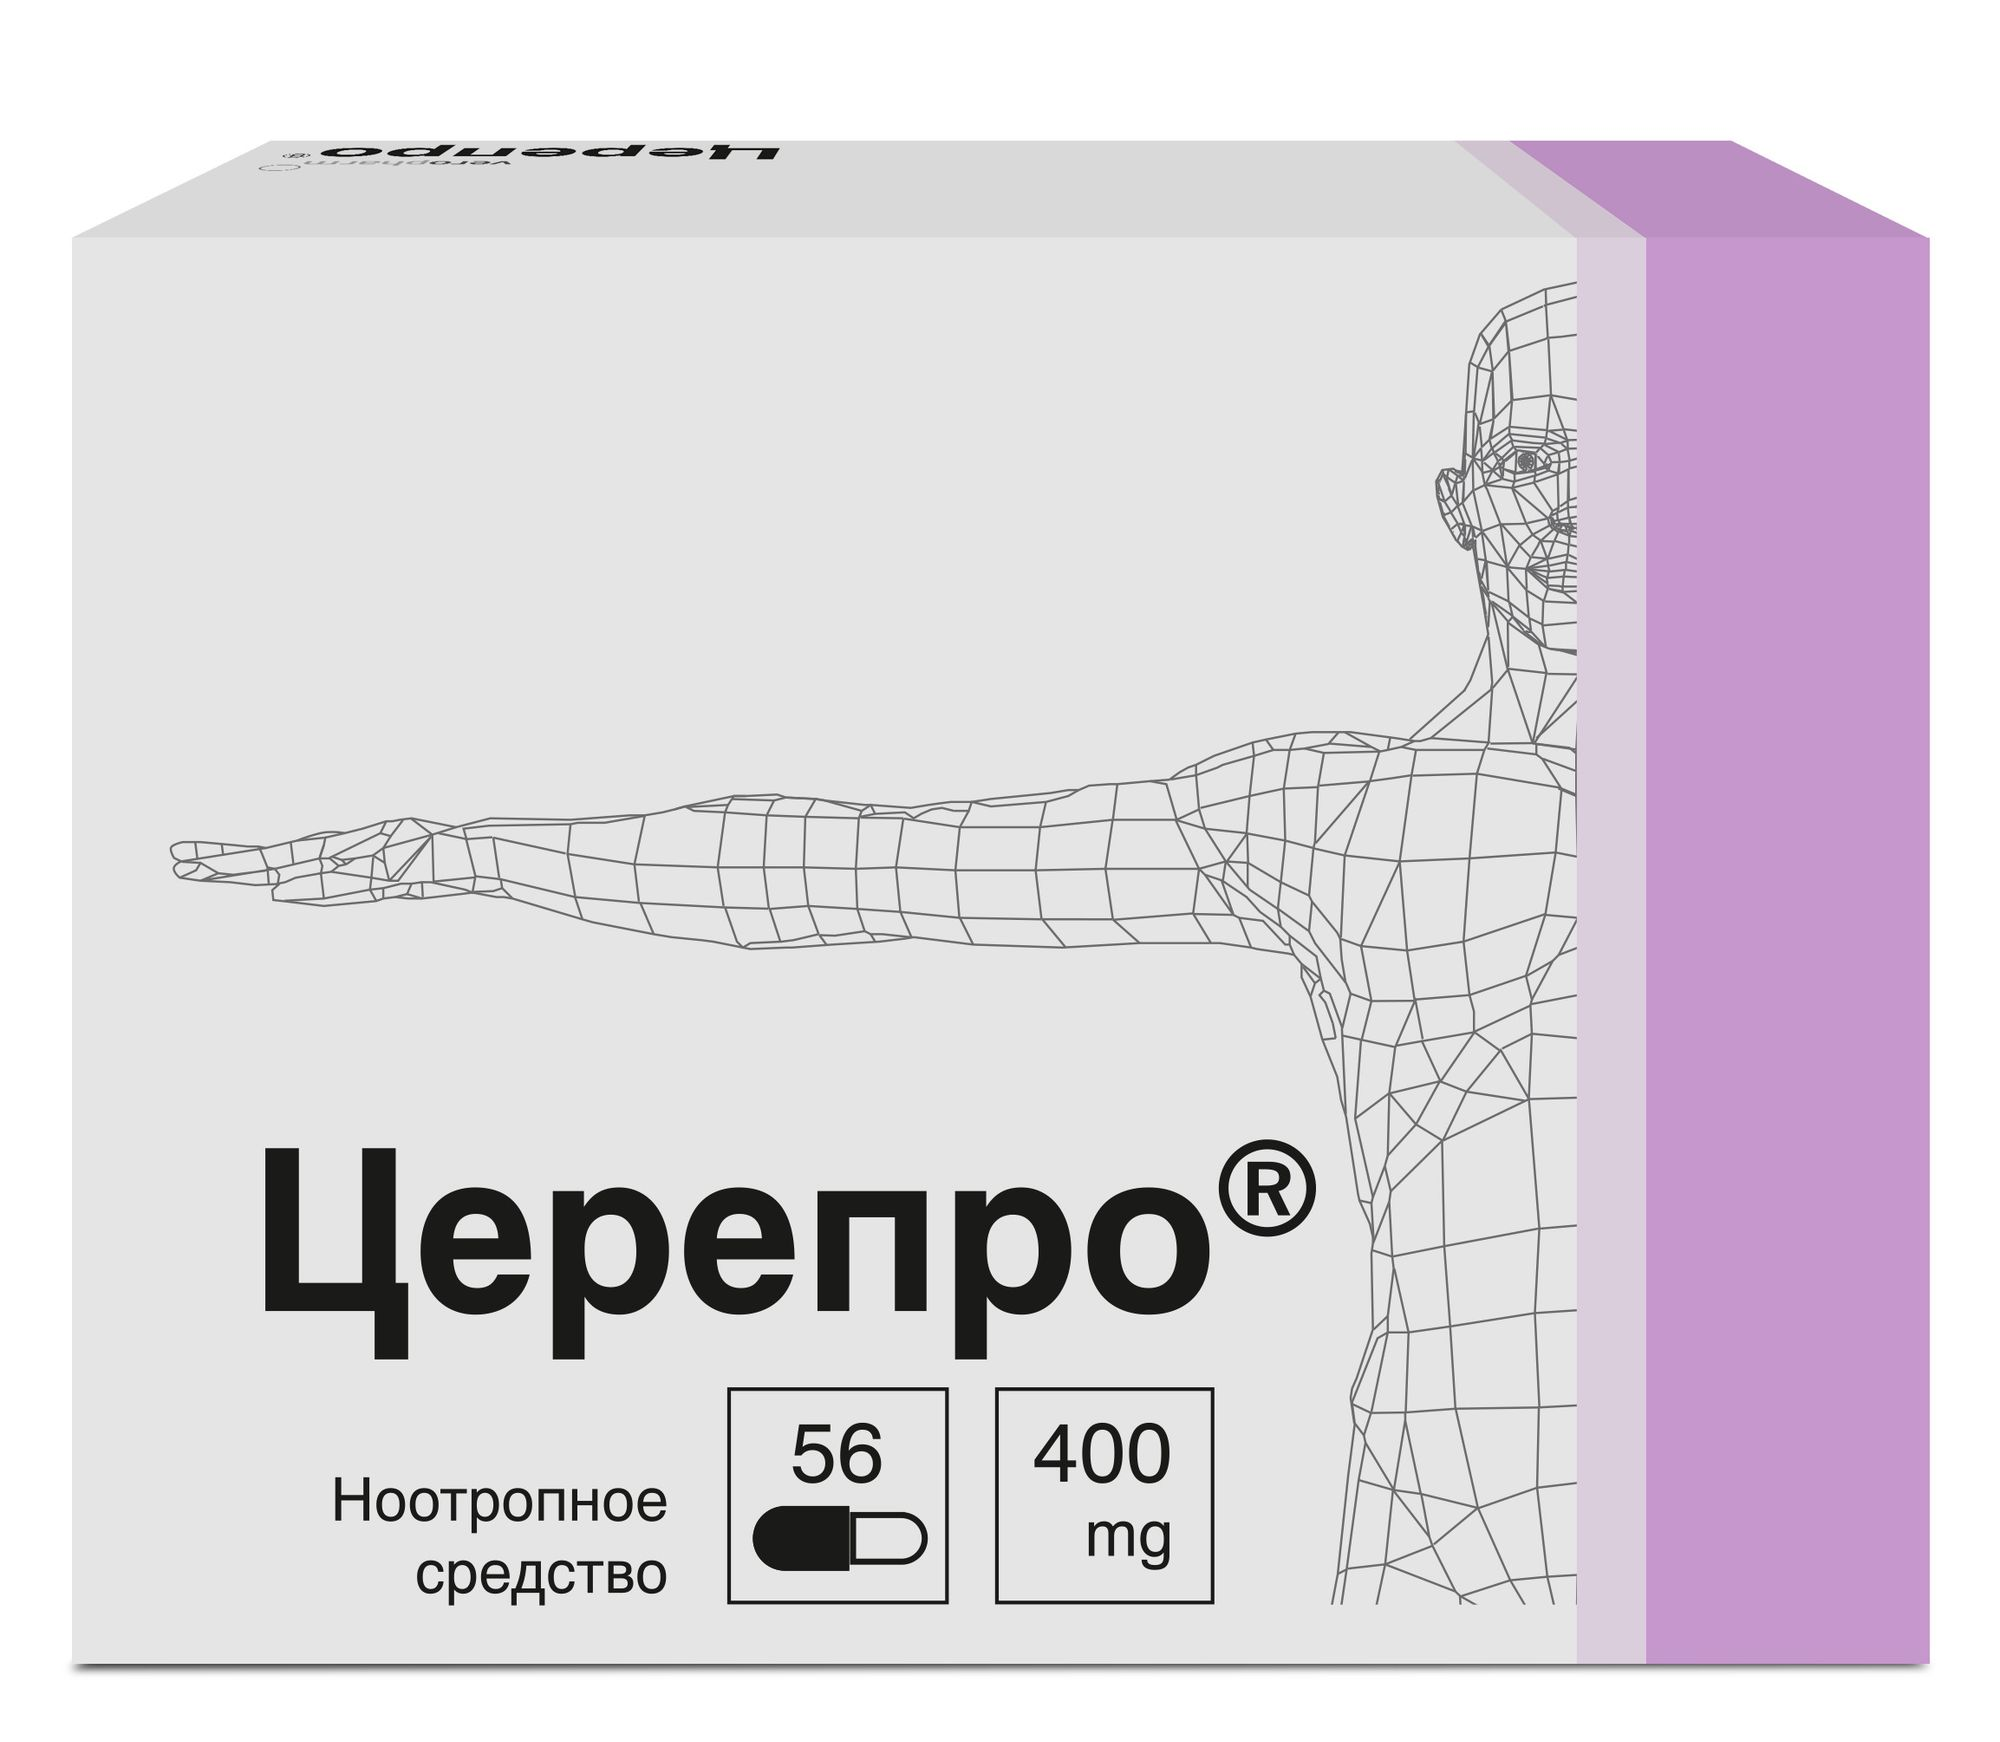 фото упаковки Церепро